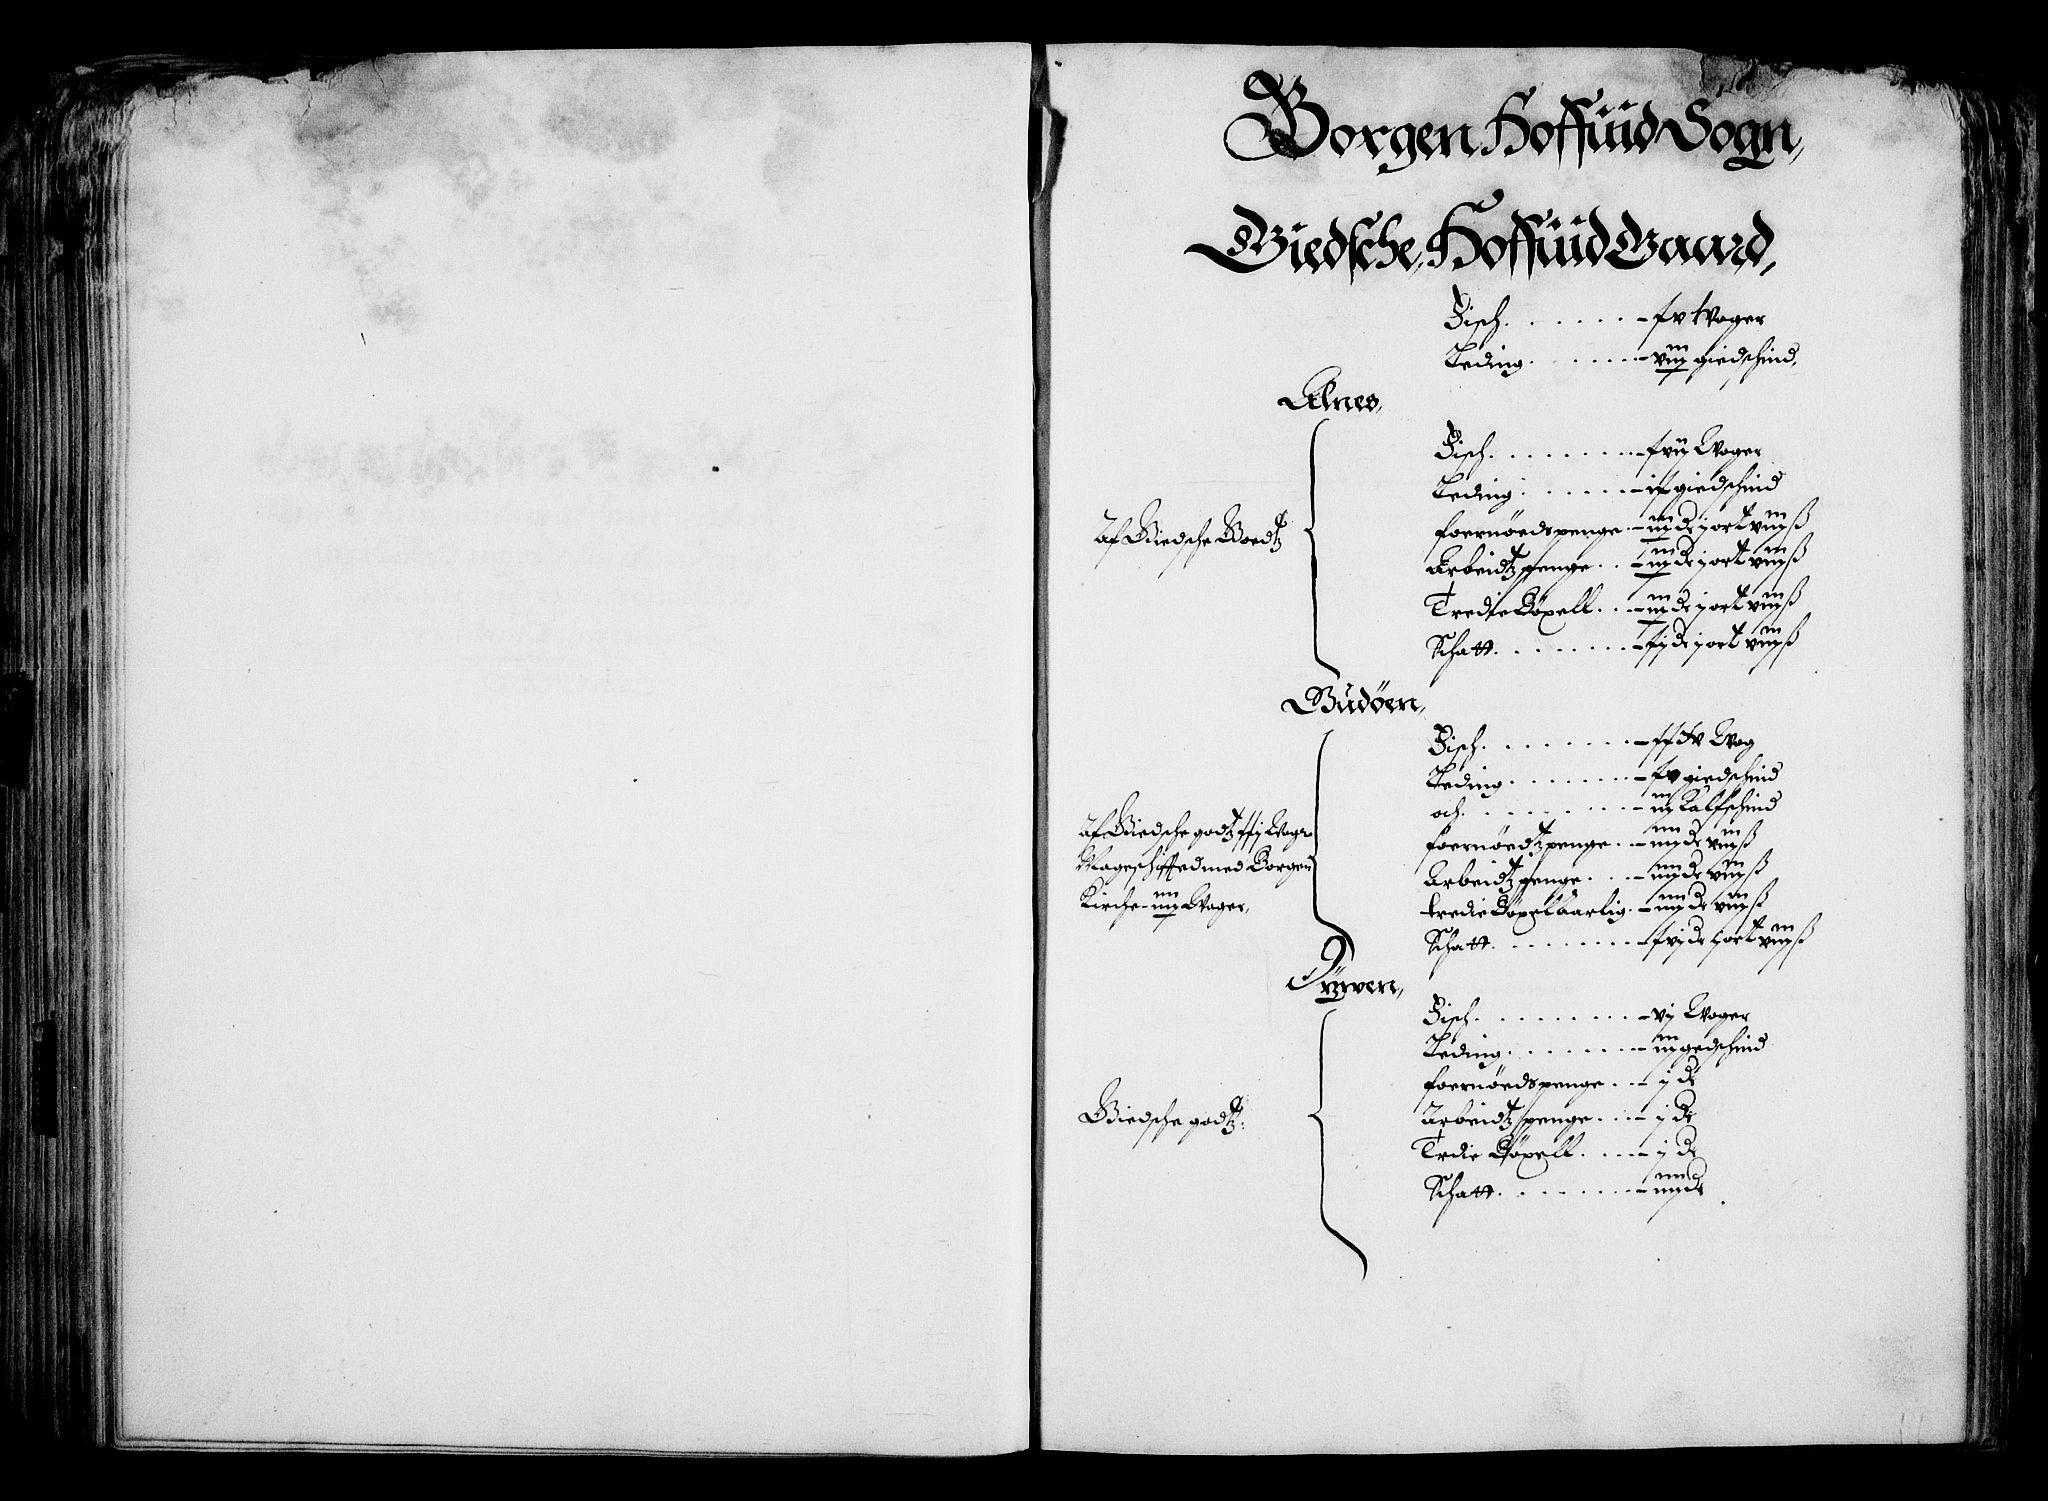 RA, Rentekammeret inntil 1814, Realistisk ordnet avdeling, On/L0001: Statens gods, 1651, s. 161